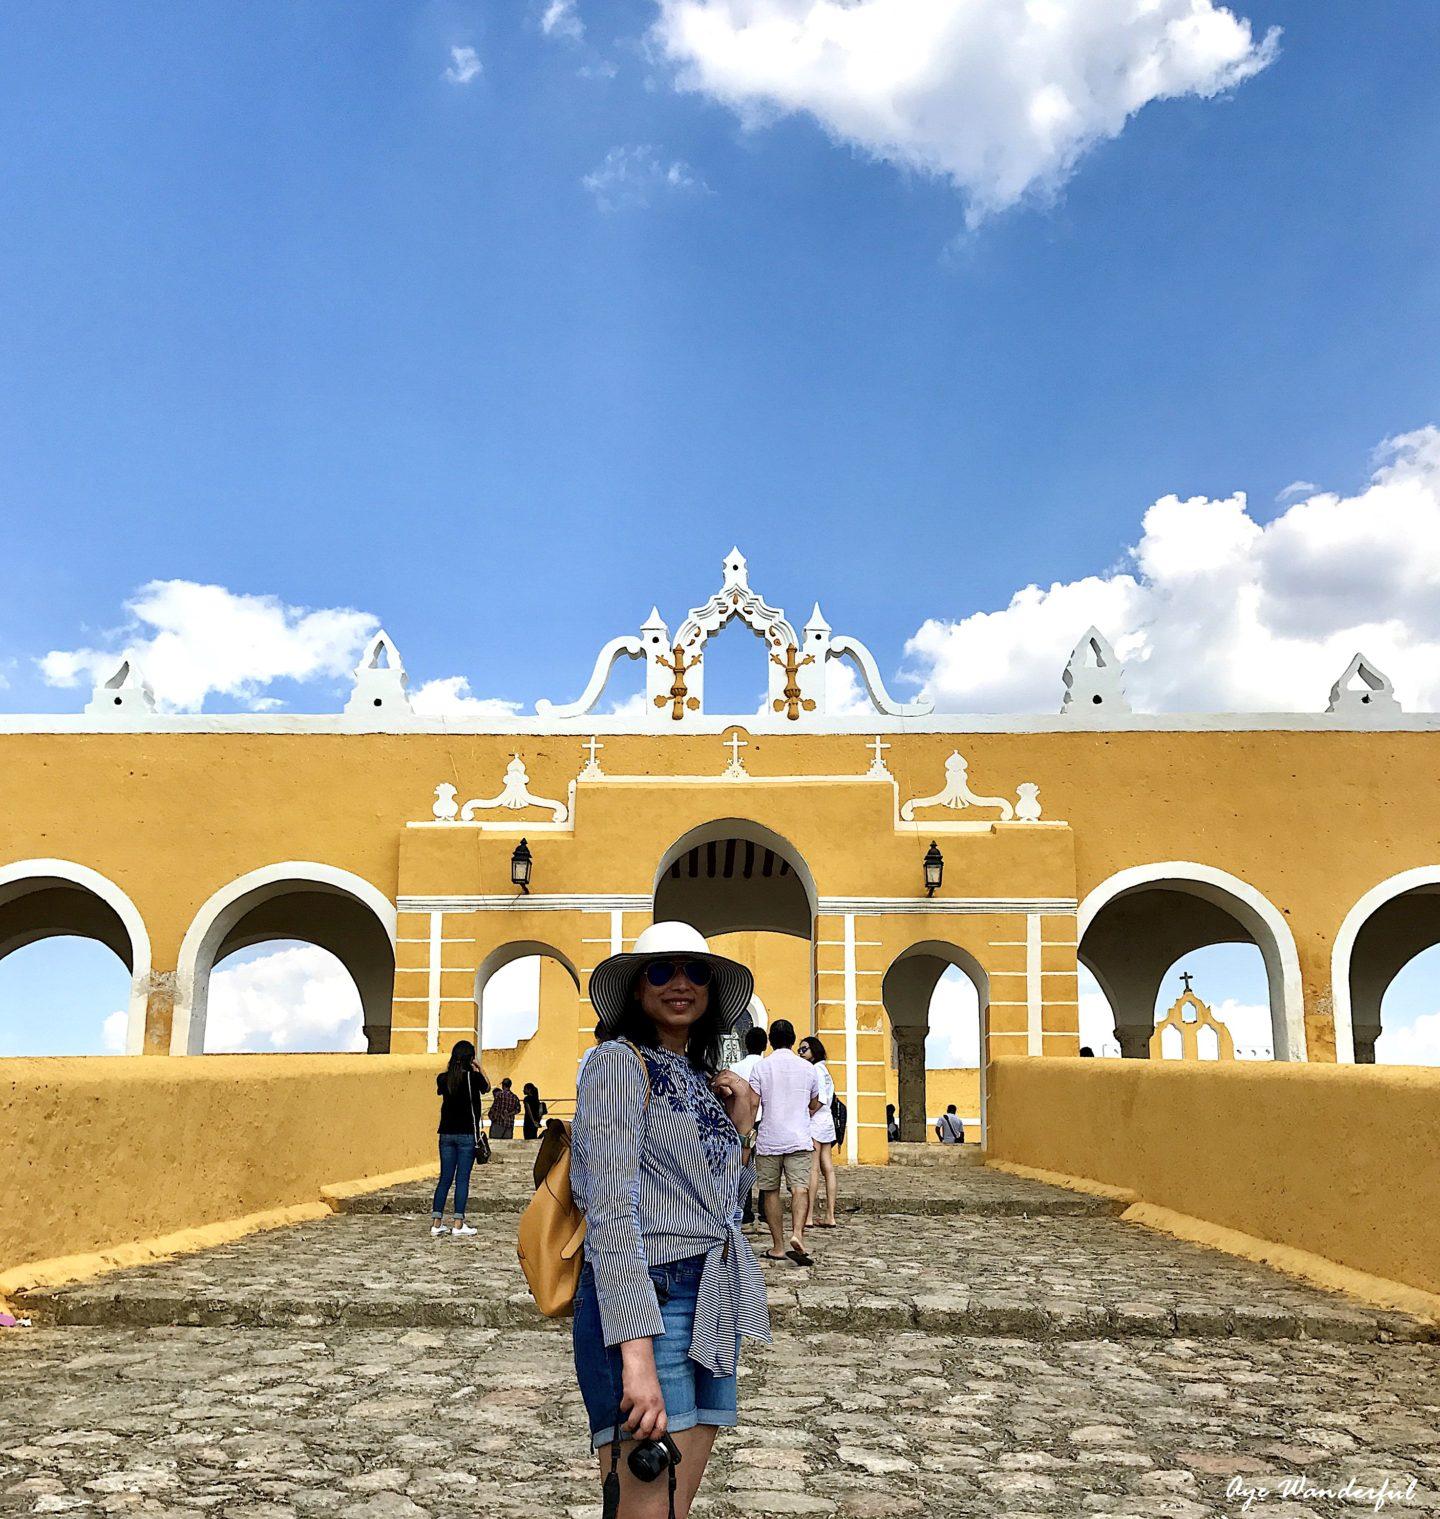 Travel Inspiration | Izamal | Mexico | Read more on www.ayewanderful.com